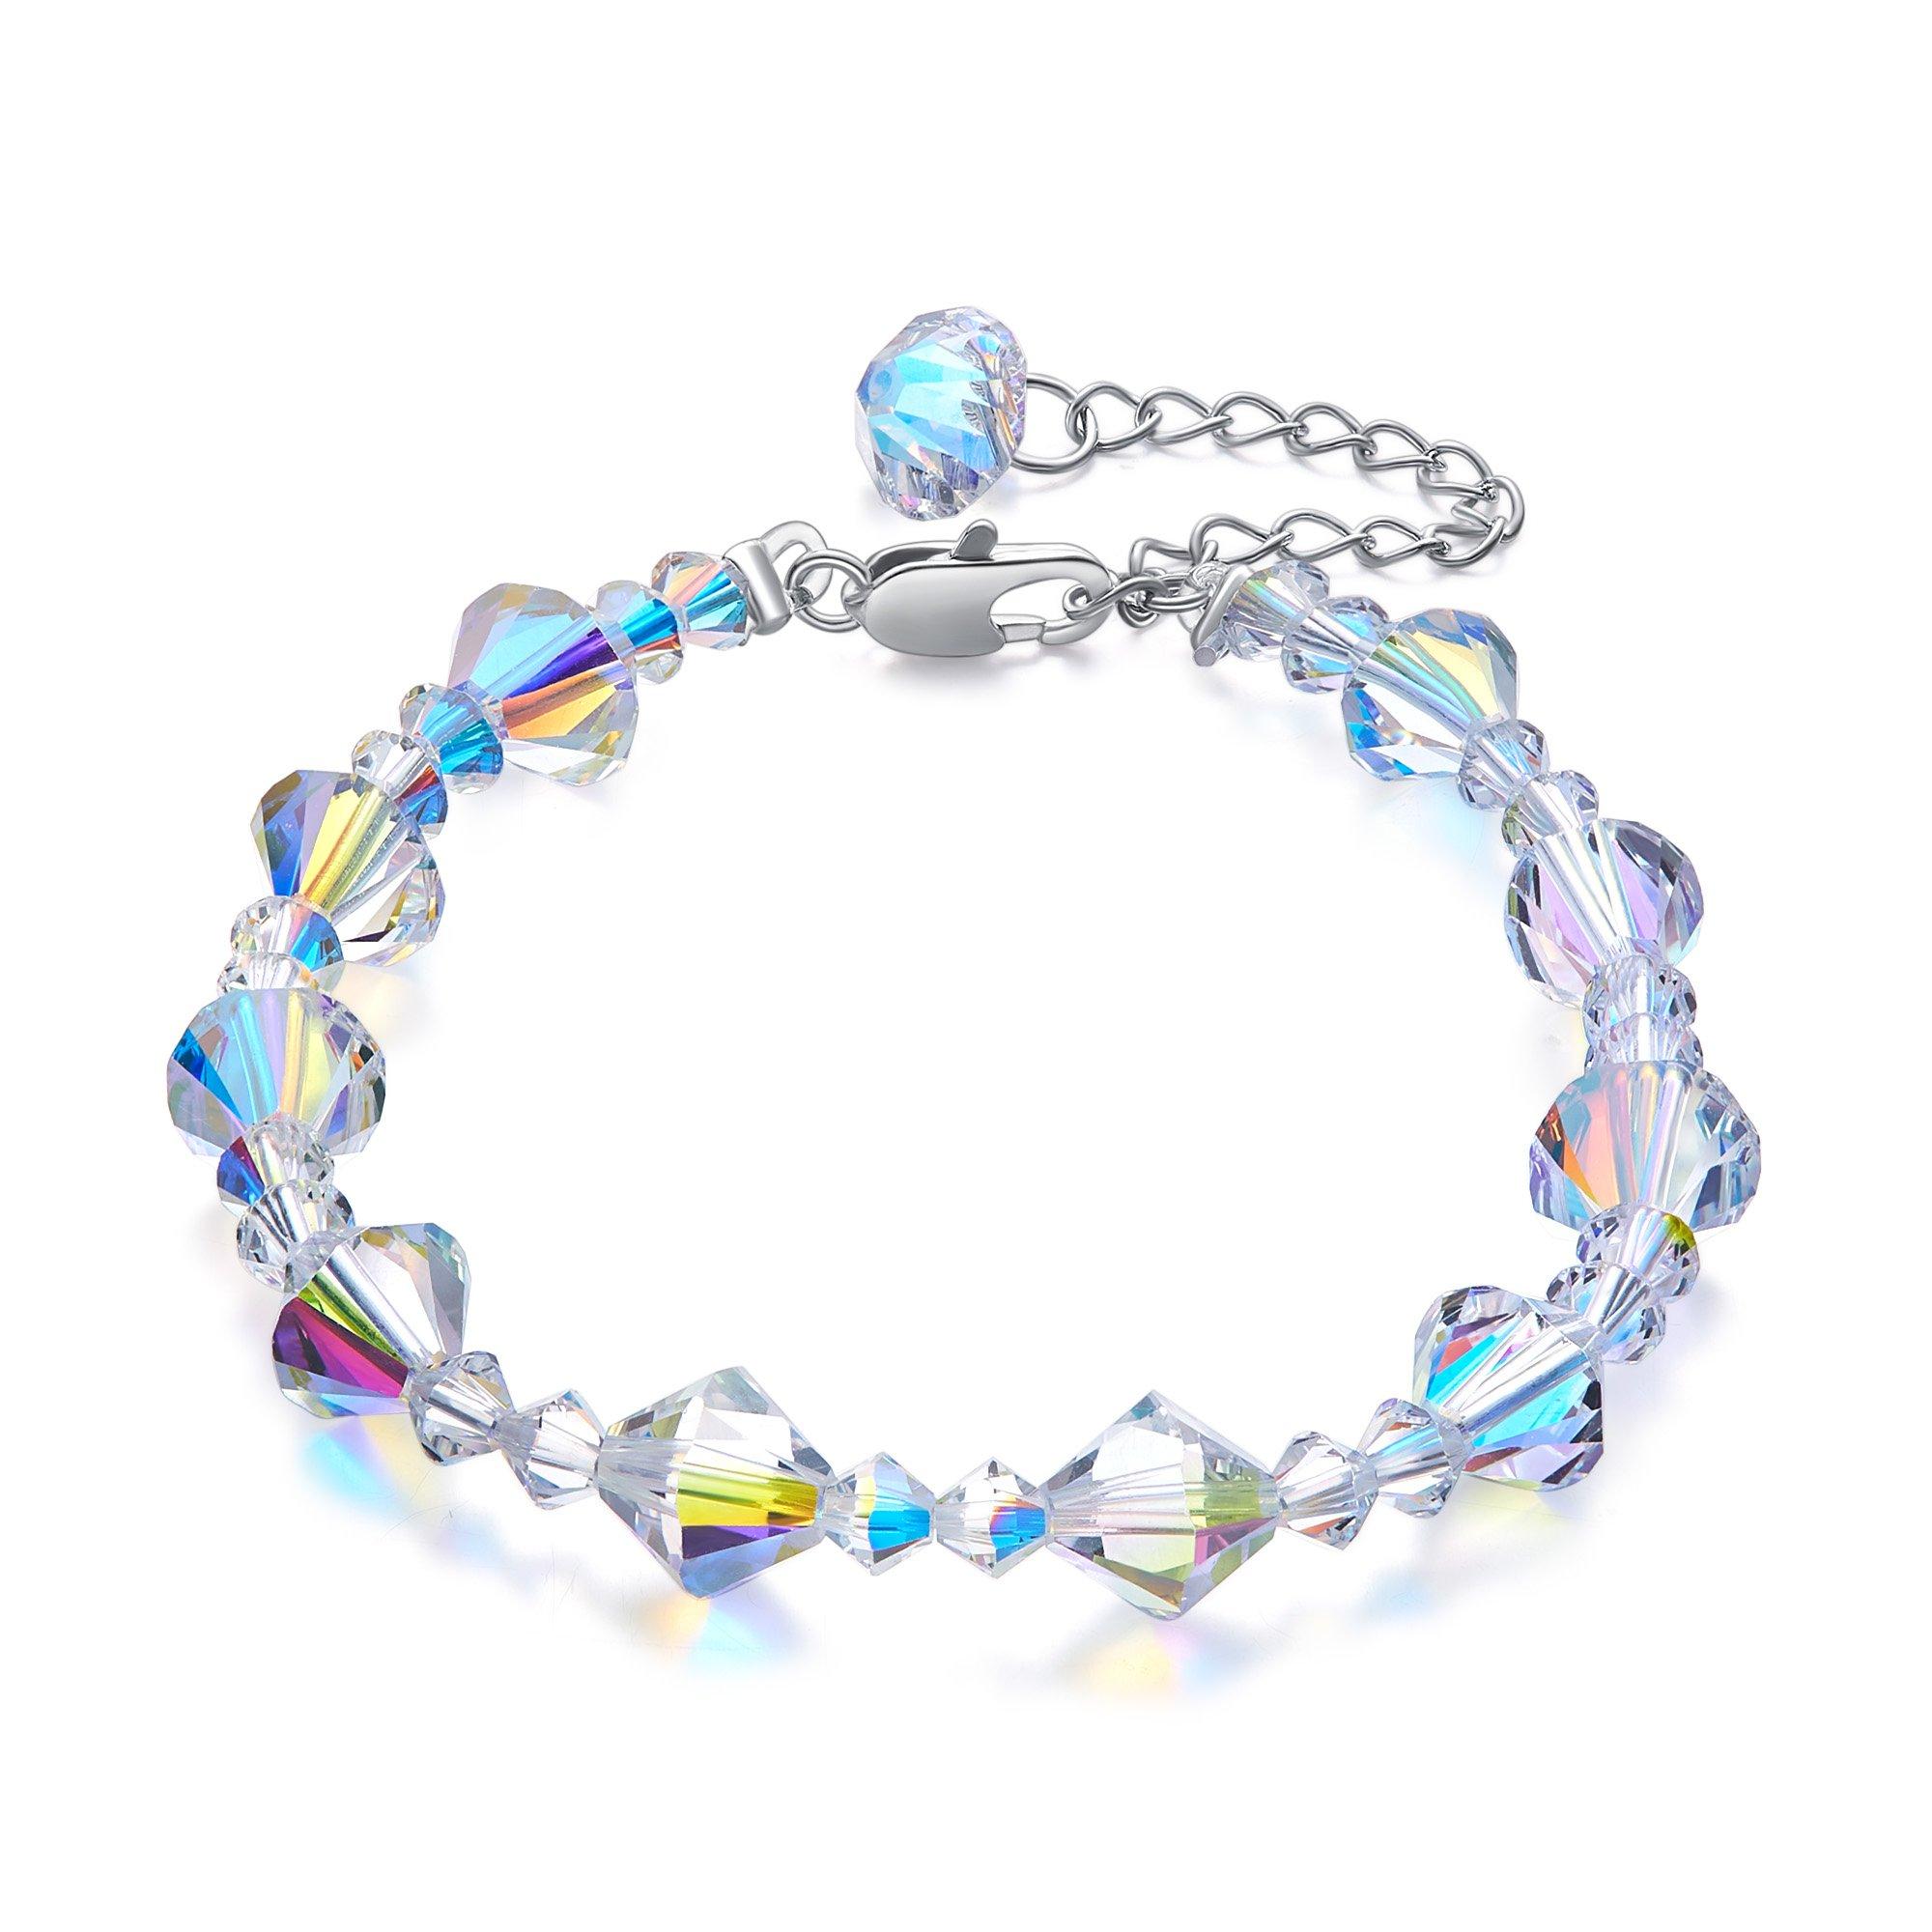 CDE ''Snow White Swarovski Bracelets 7''-9'' Adjustable Strand Bracelet Women Fashion Jewelry Gifts for Her